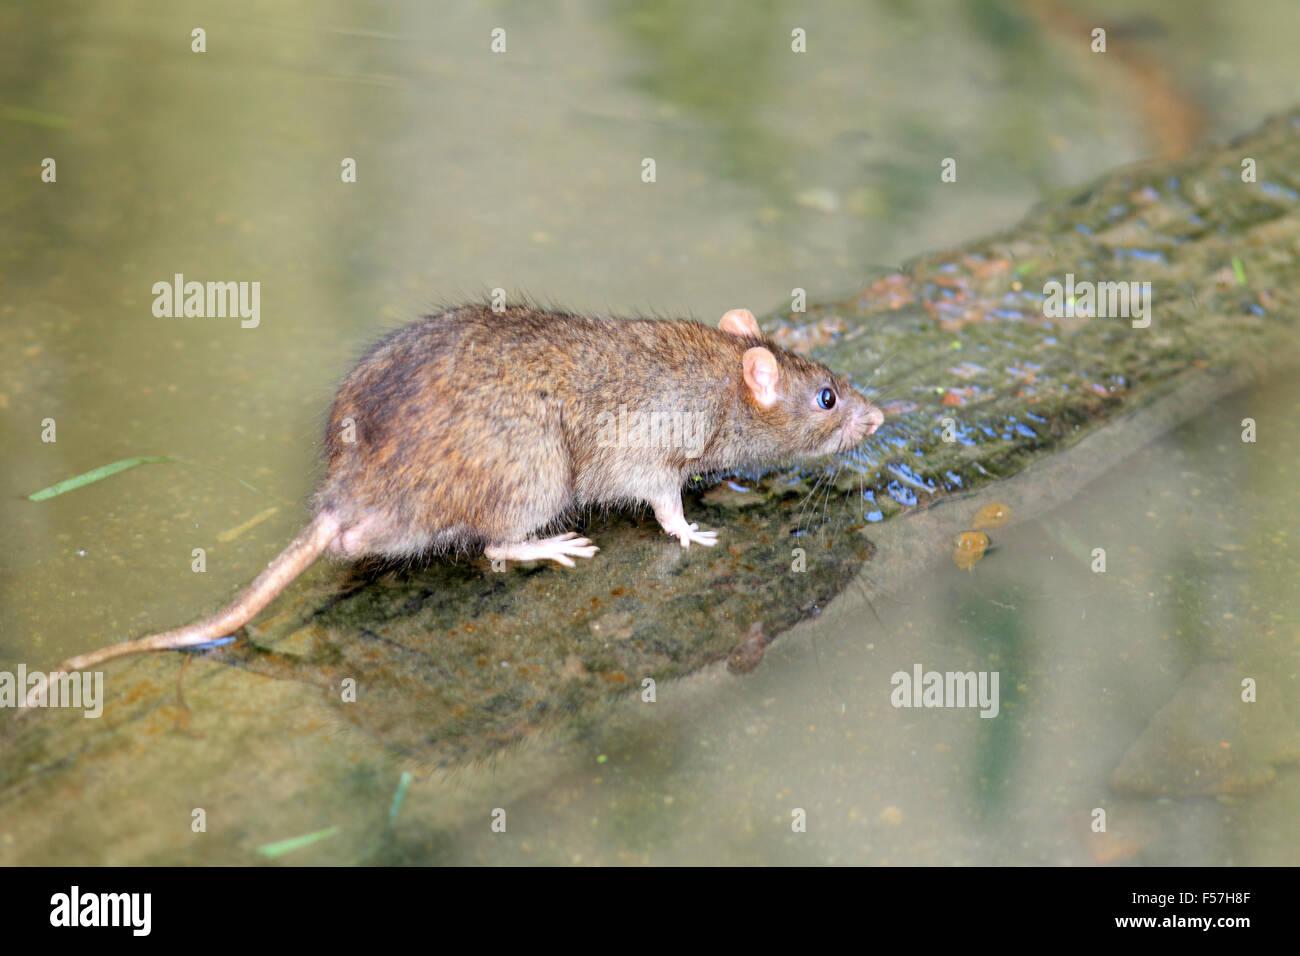 Norway rat (Rattus norvegicus) in Japan - Stock Image